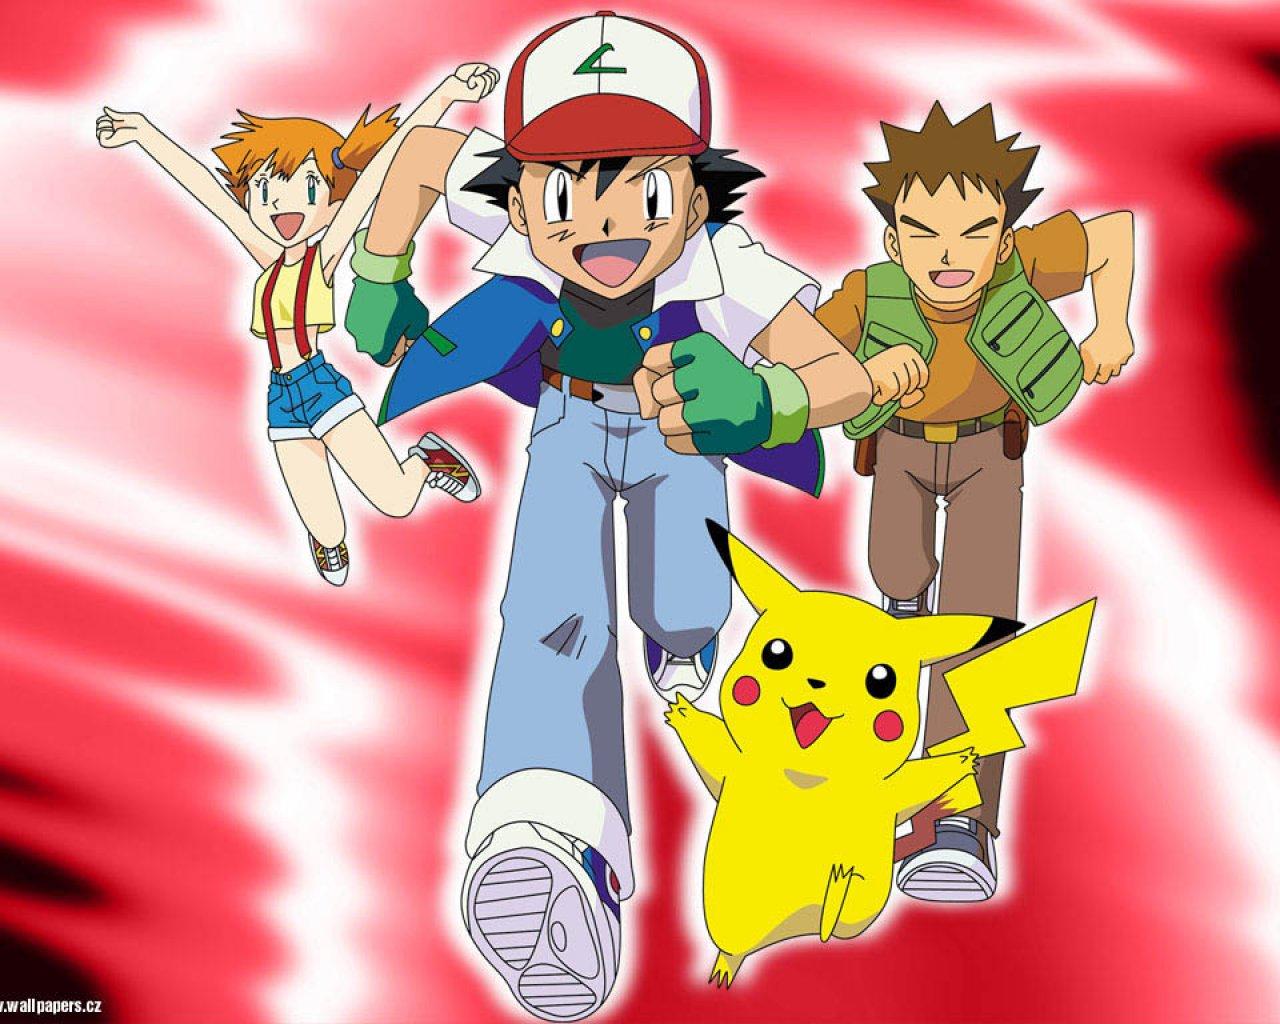 http://2.bp.blogspot.com/-CW5ckCAl6aQ/TkdznWvfcFI/AAAAAAAAADE/GMFASxHSX6c/s1600/2479-pokemon-002-exjll.jpg